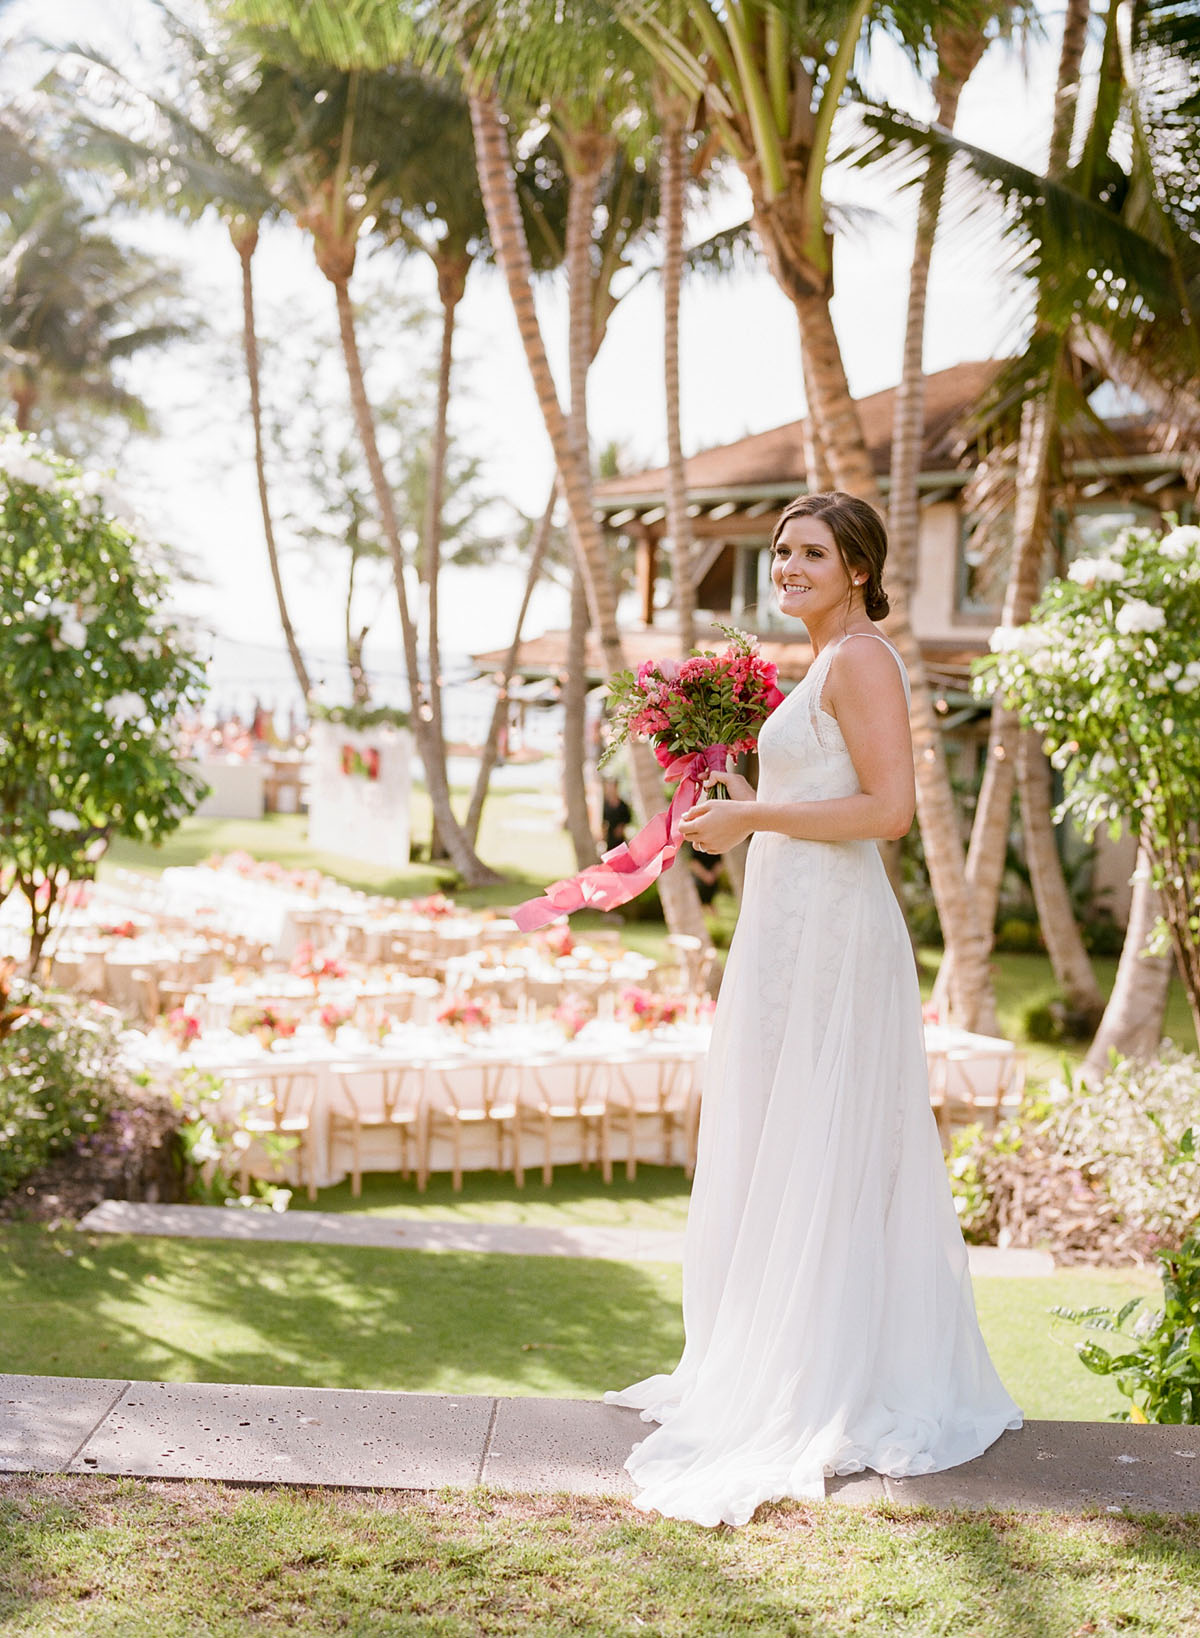 13-turtle-pointe-wedding-maui.jpg